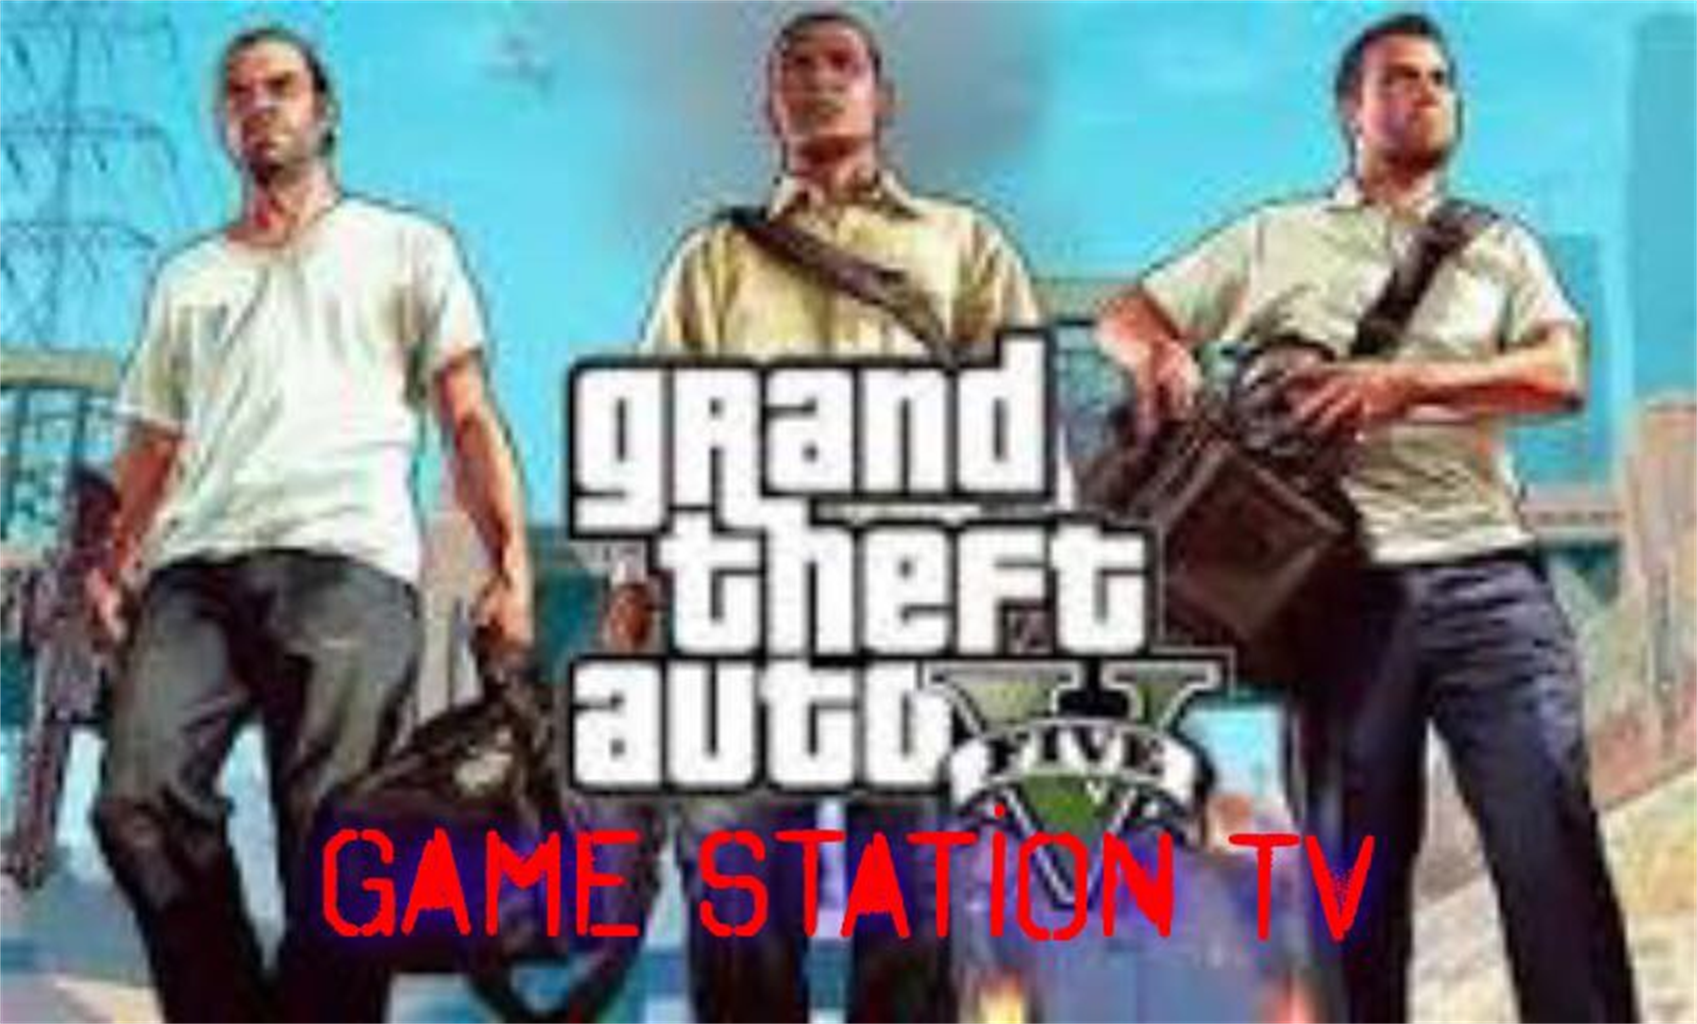 Game Station TV